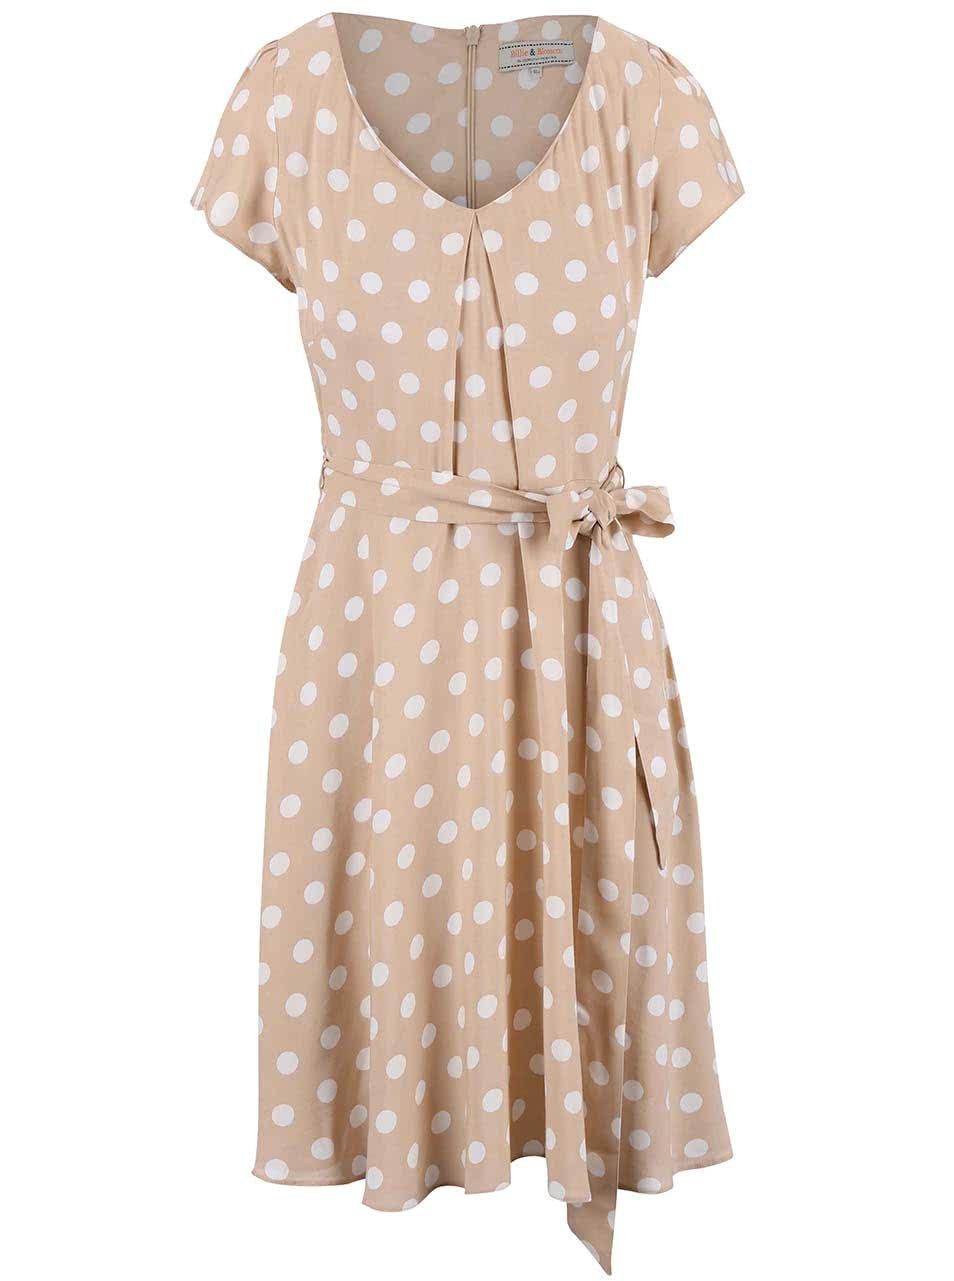 Béžové šaty s puntíky Dorothy Perkins